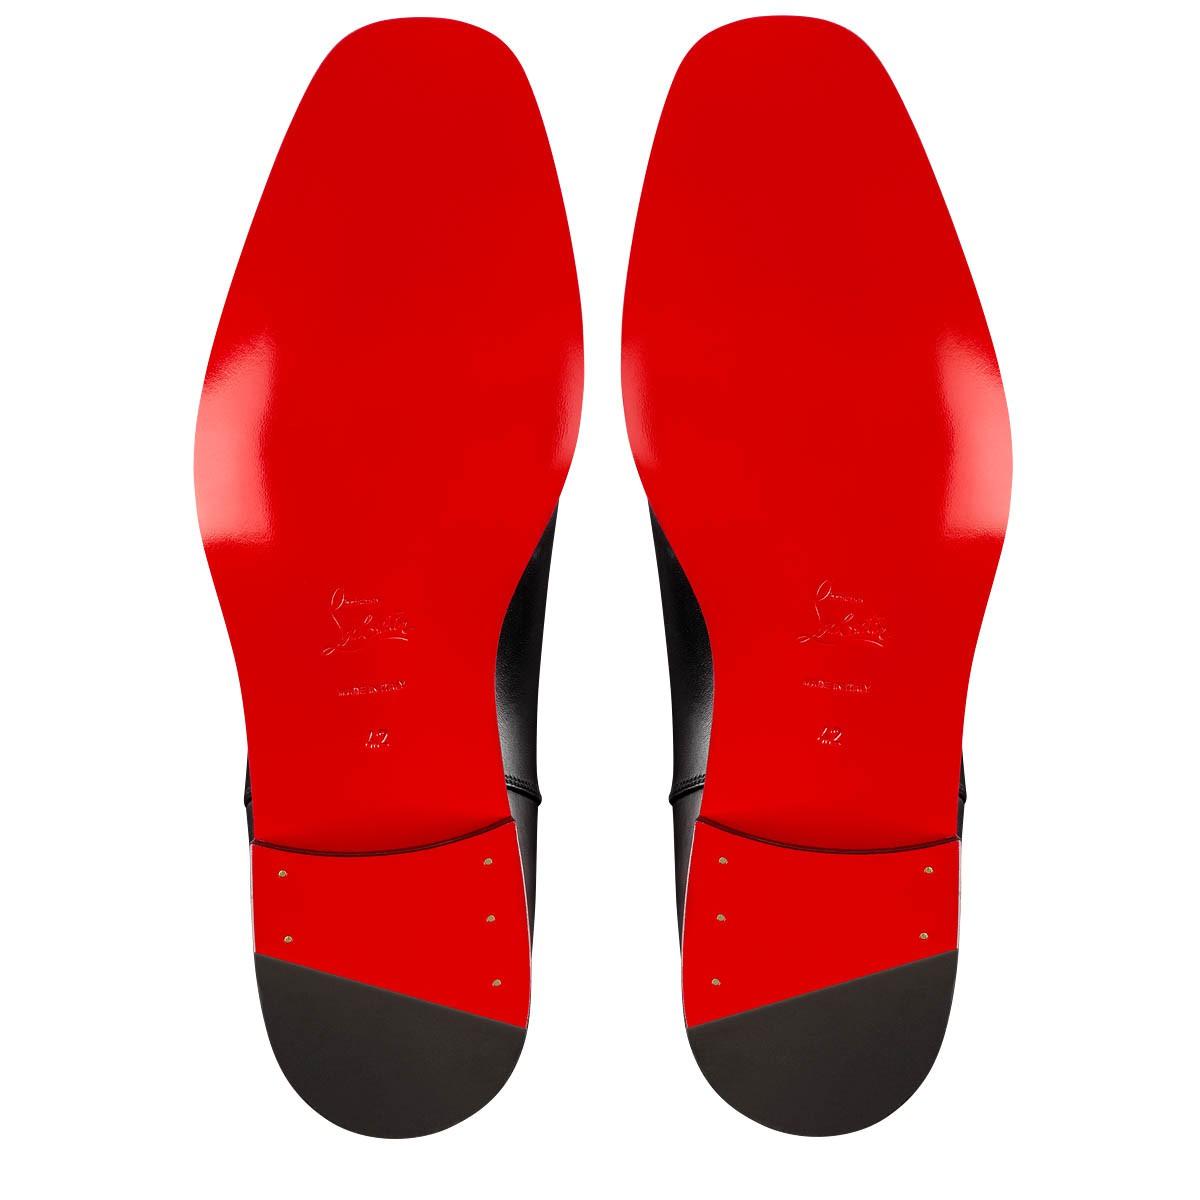 Shoes - Kicko - Christian Louboutin